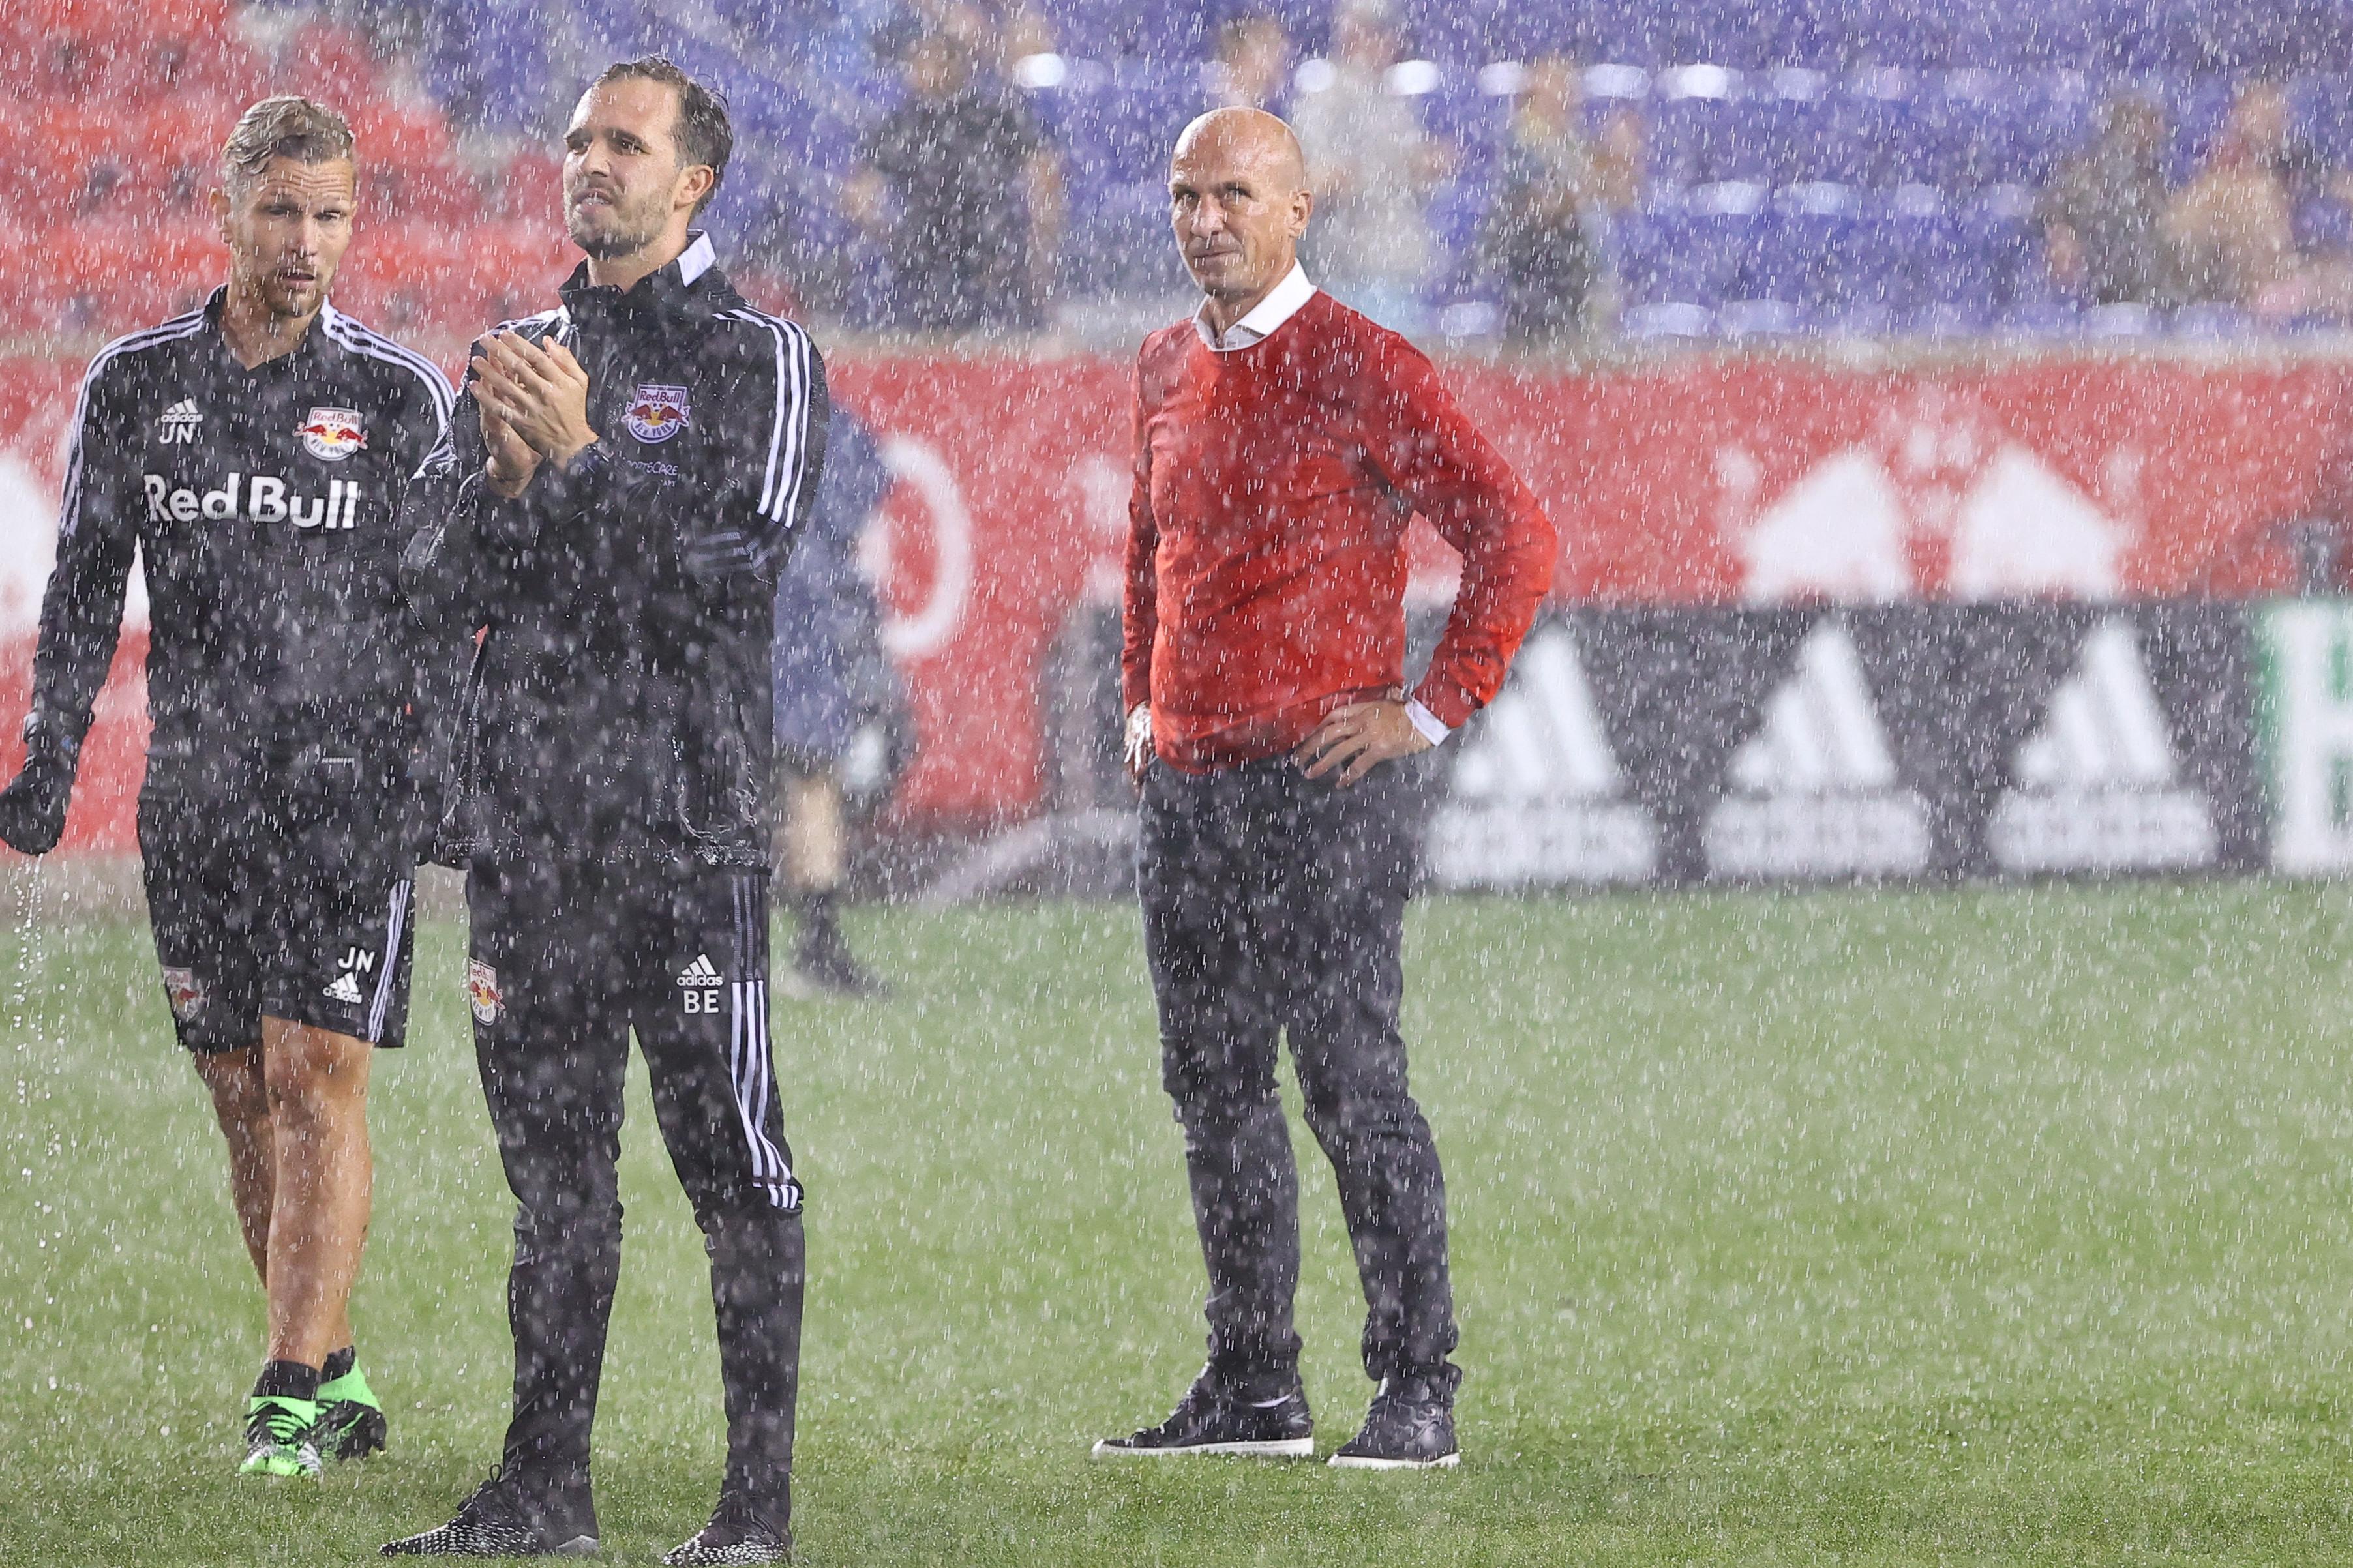 SOCCER: AUG 21 MLS - New York City FC at New York Red Bulls